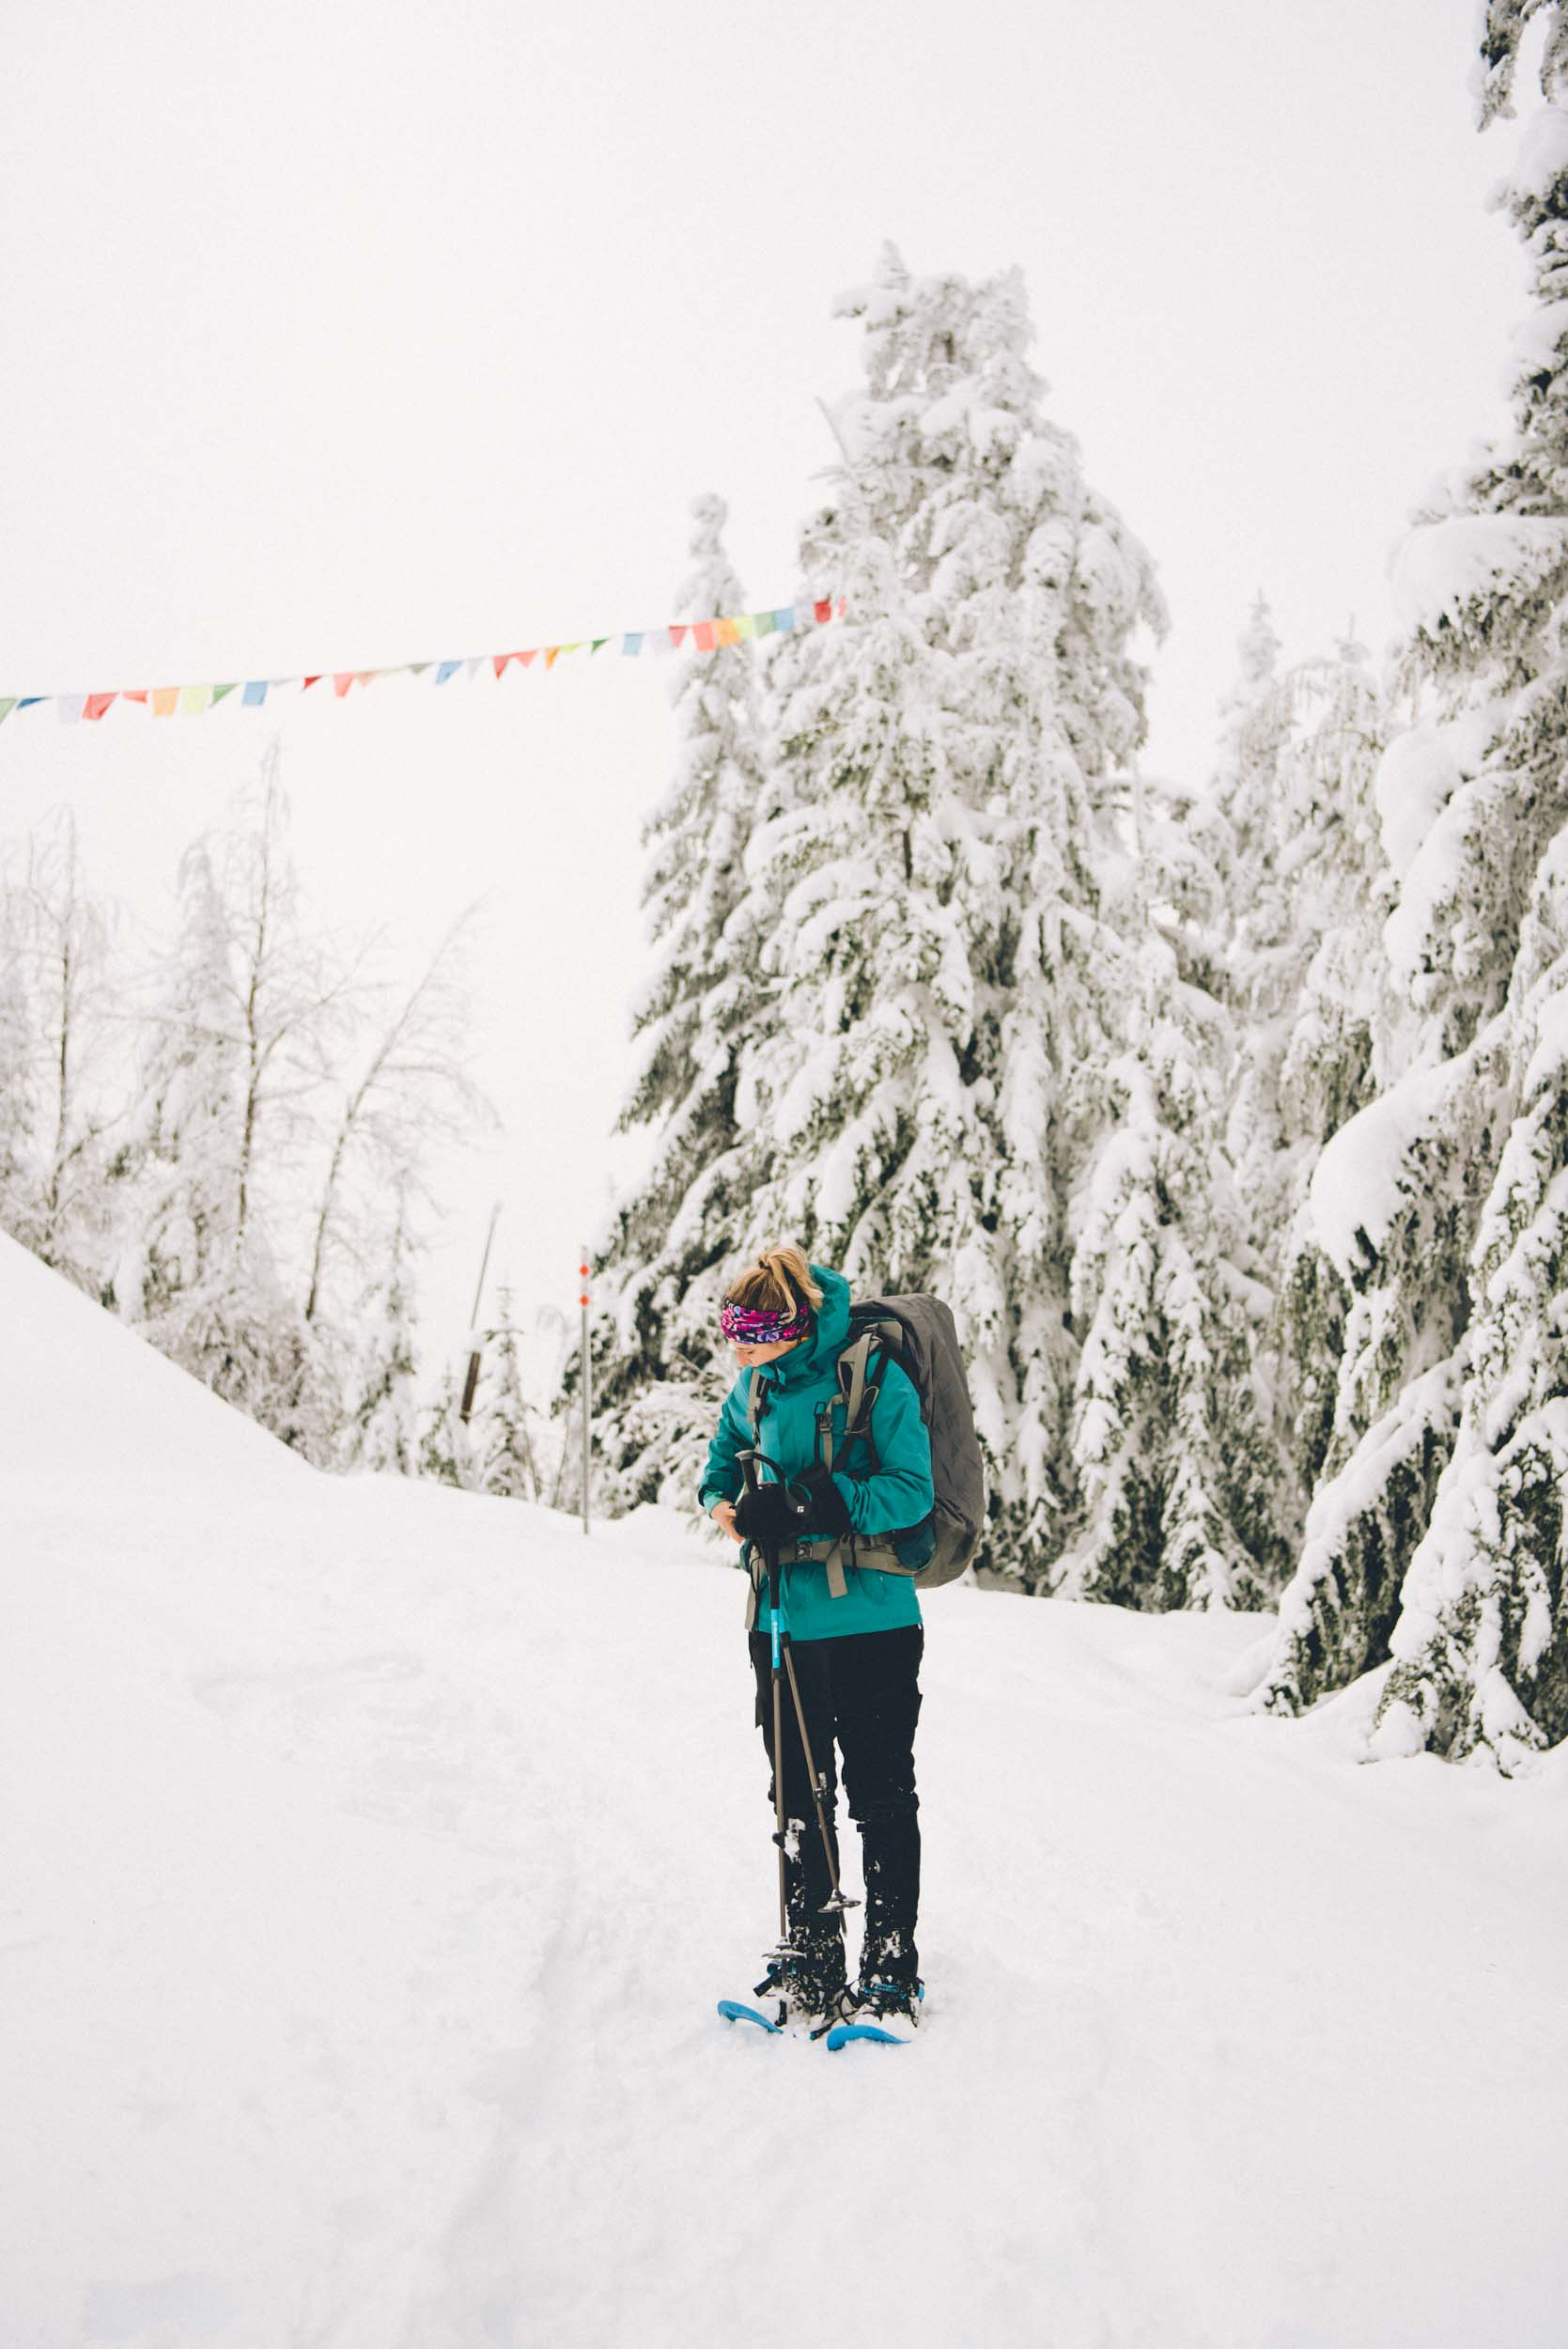 Miriam-Subbiah-Snow-Bowl-Hut-29.jpg